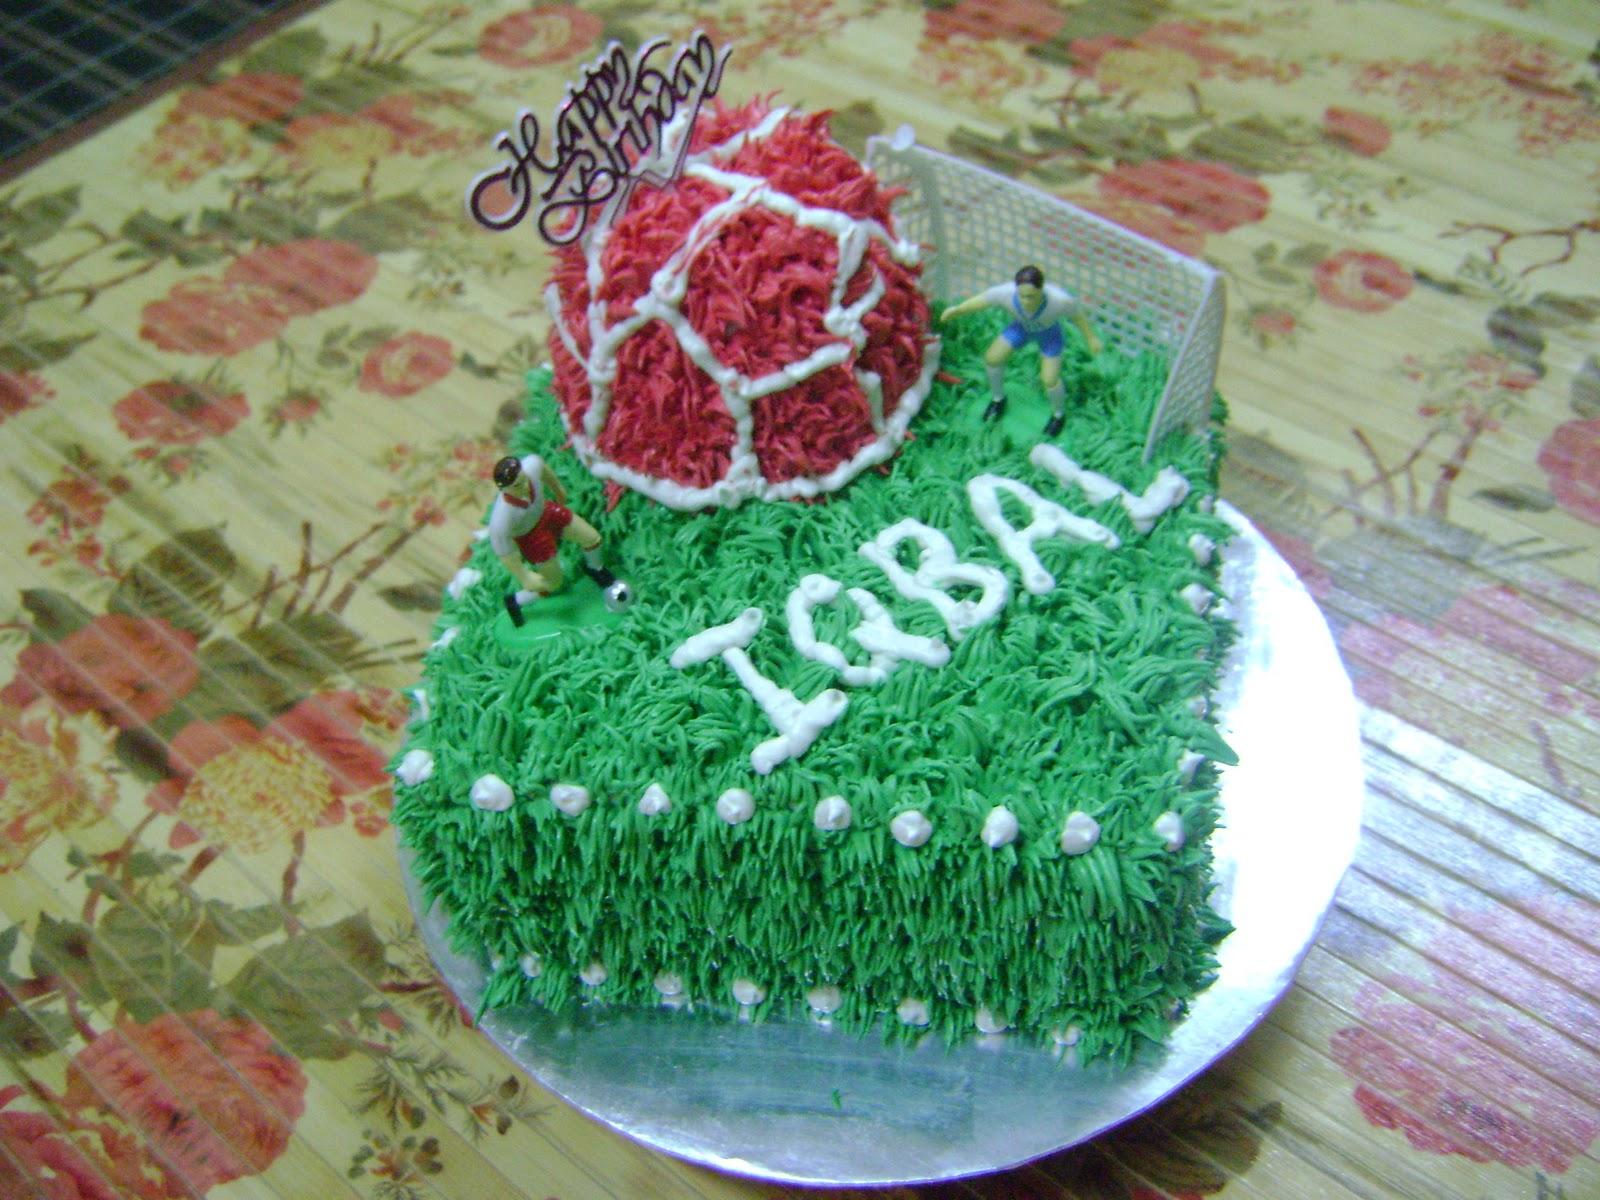 Birthday Cake With Name Qamar ~ Rabia qamar rabiaqamar twitter